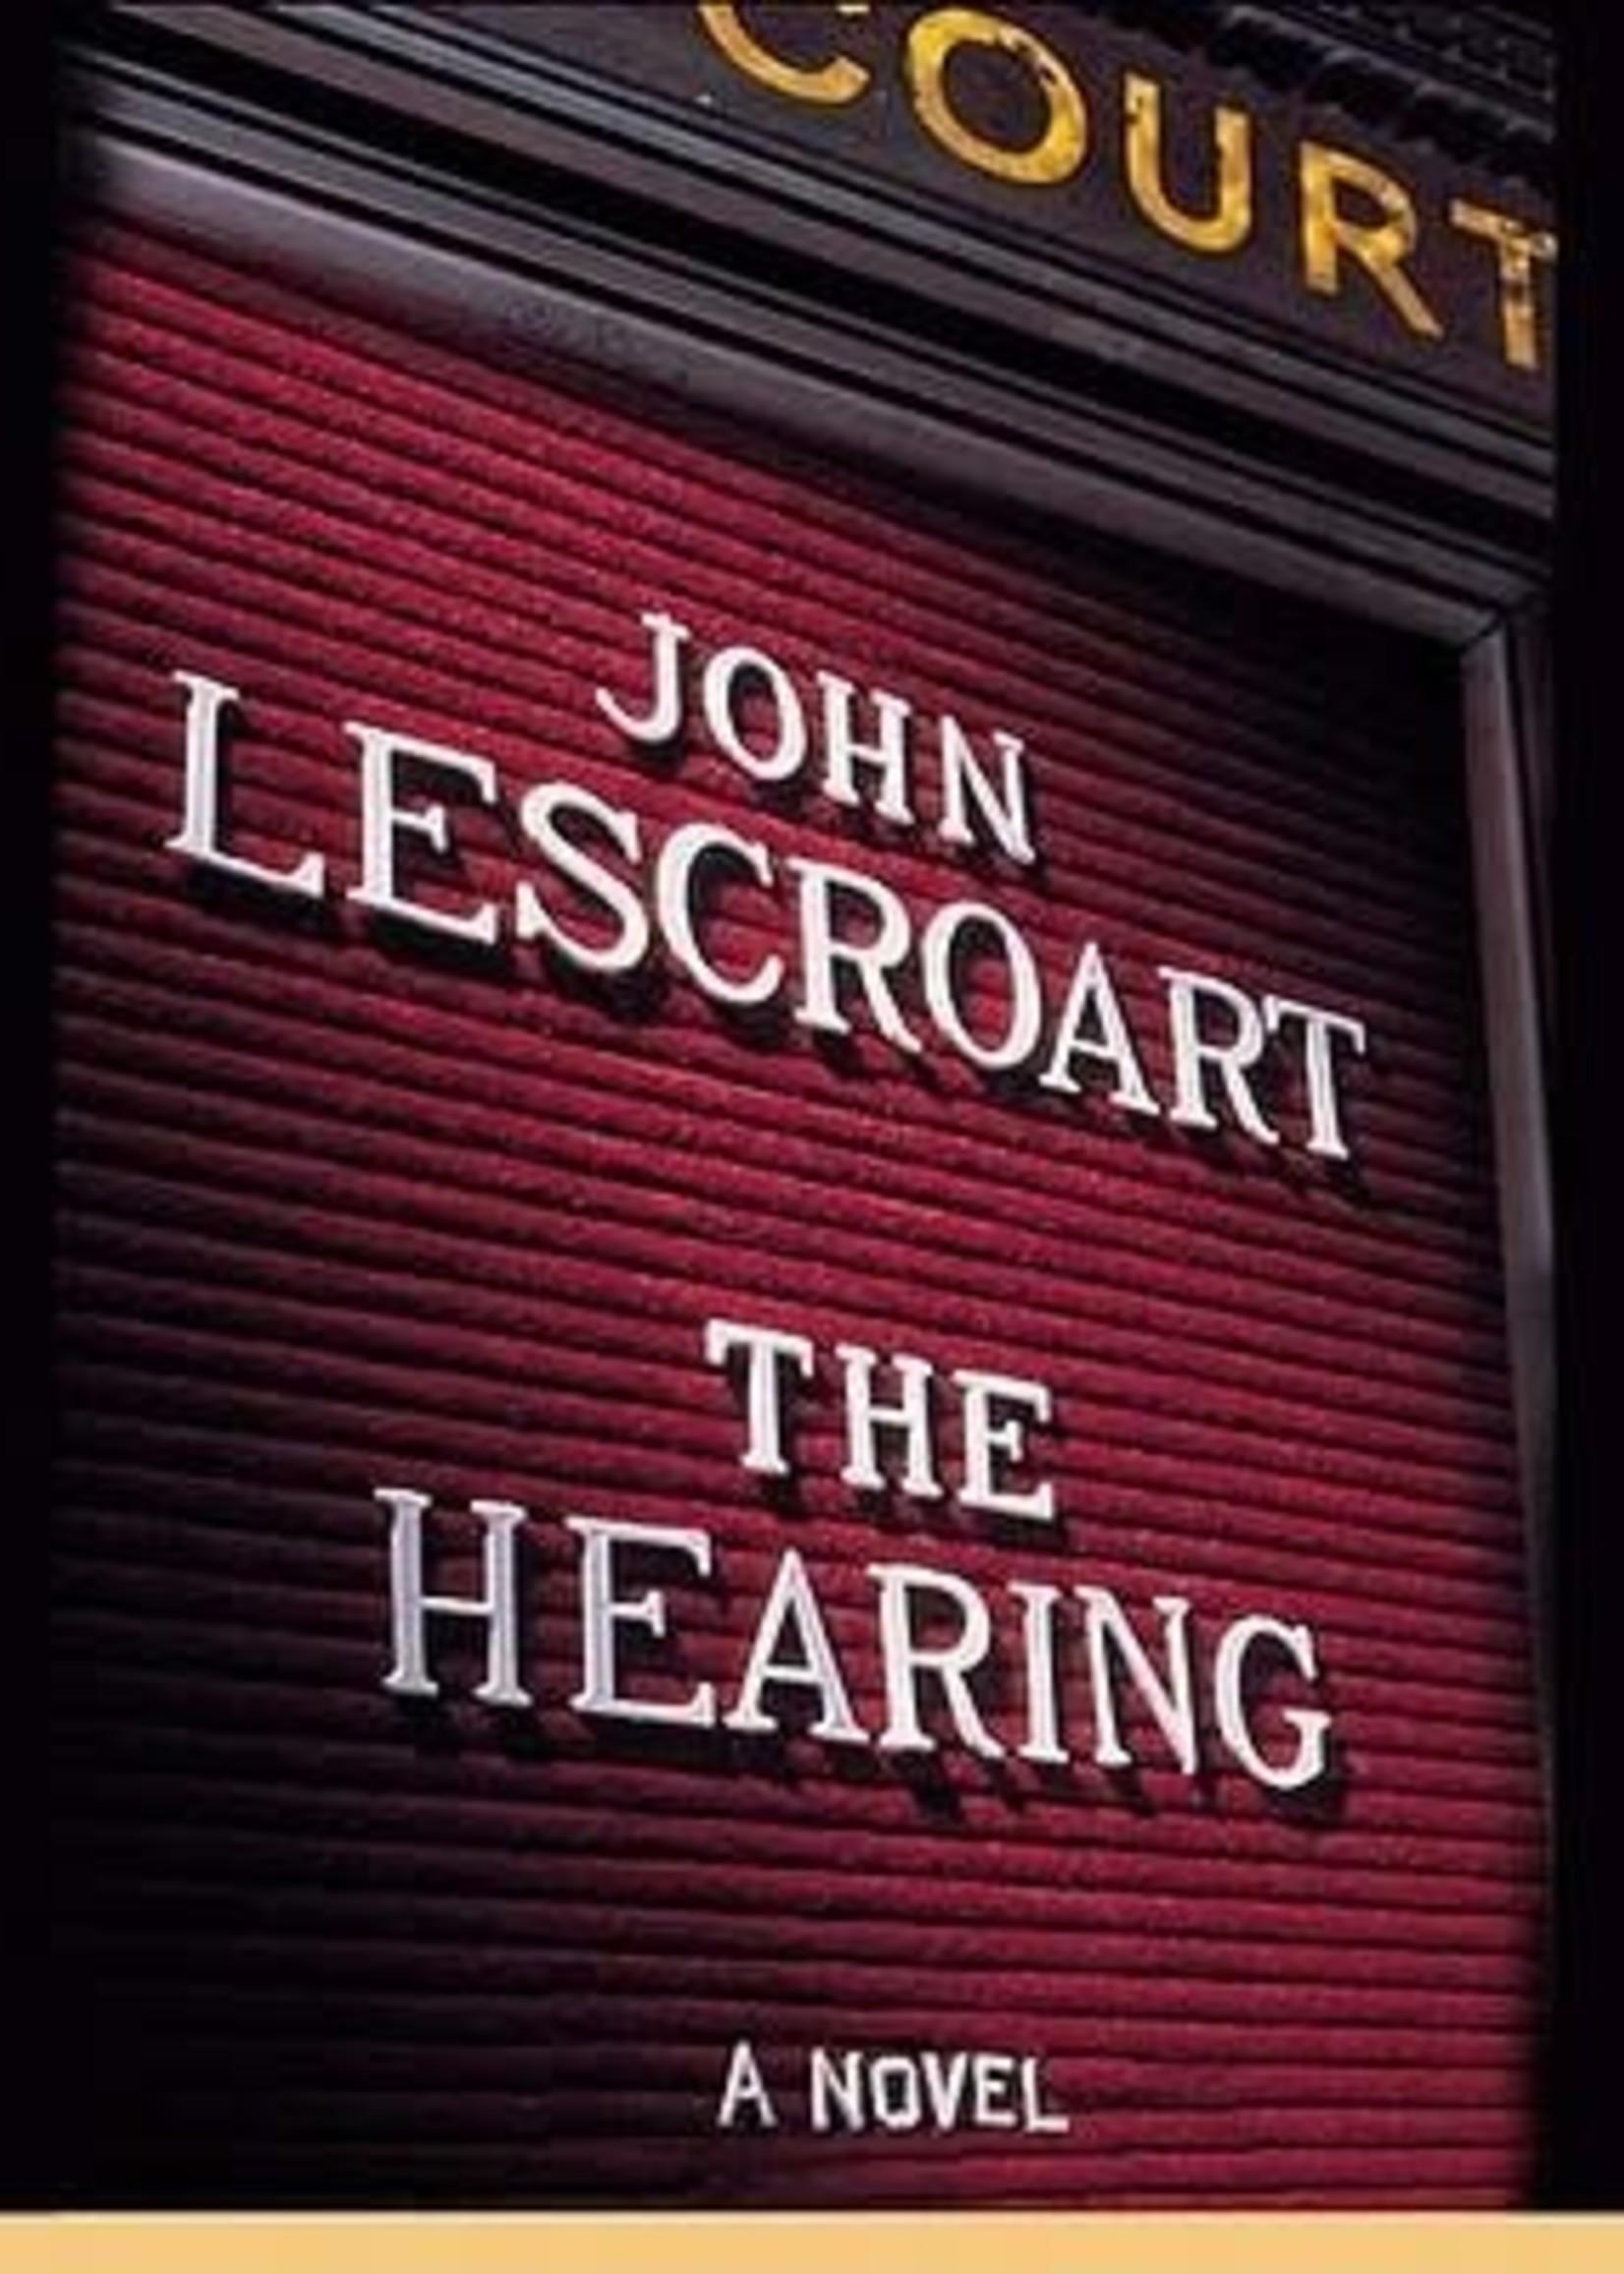 USED - The Hearing by John Lescroart